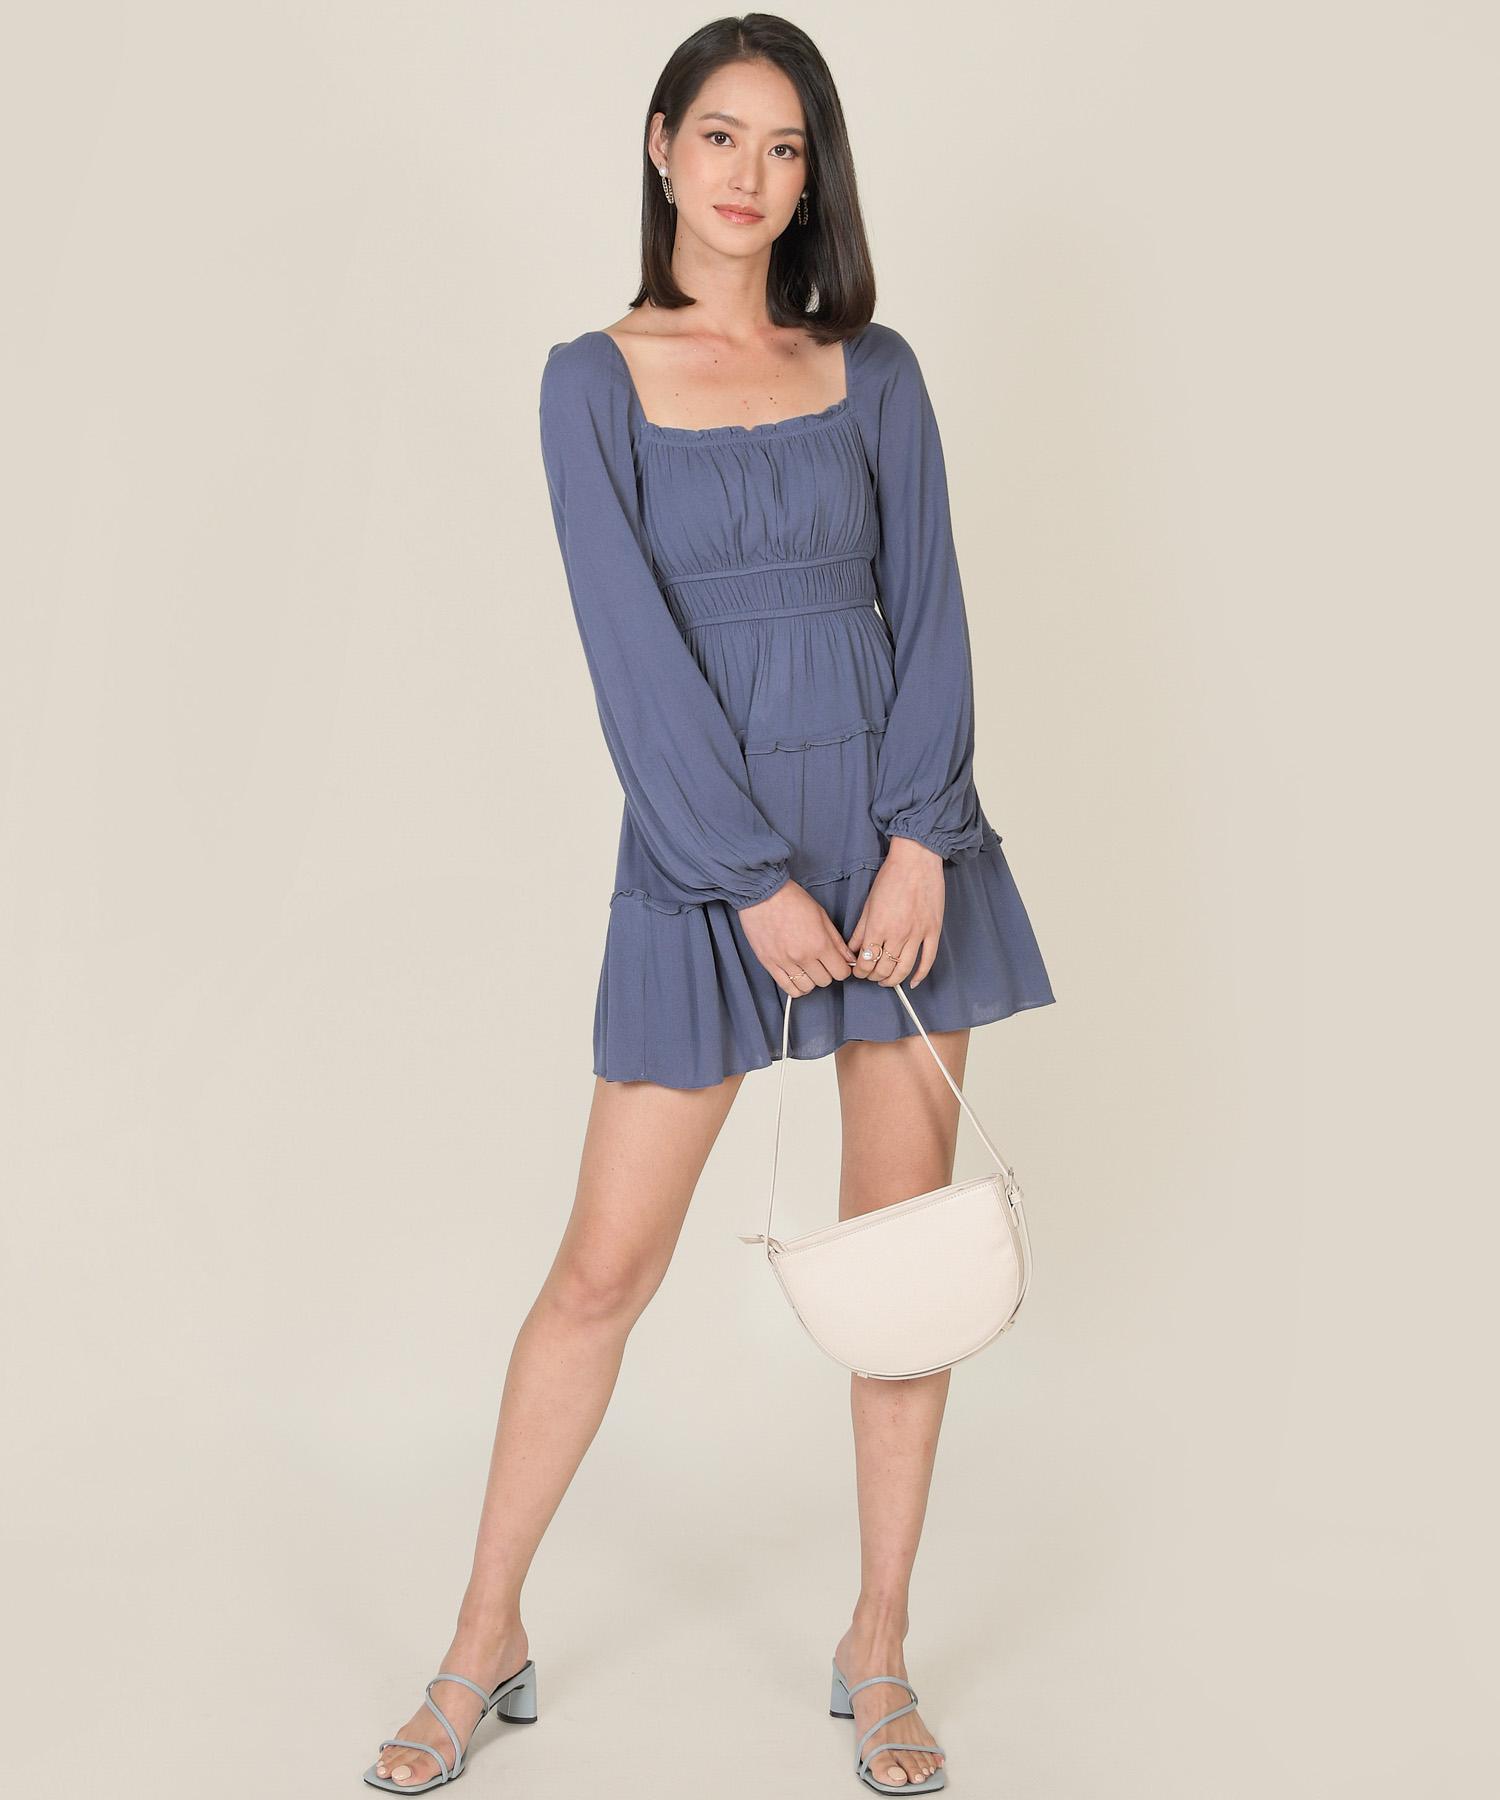 mariposa-ruffle-tiered-dress-dust-blue-1